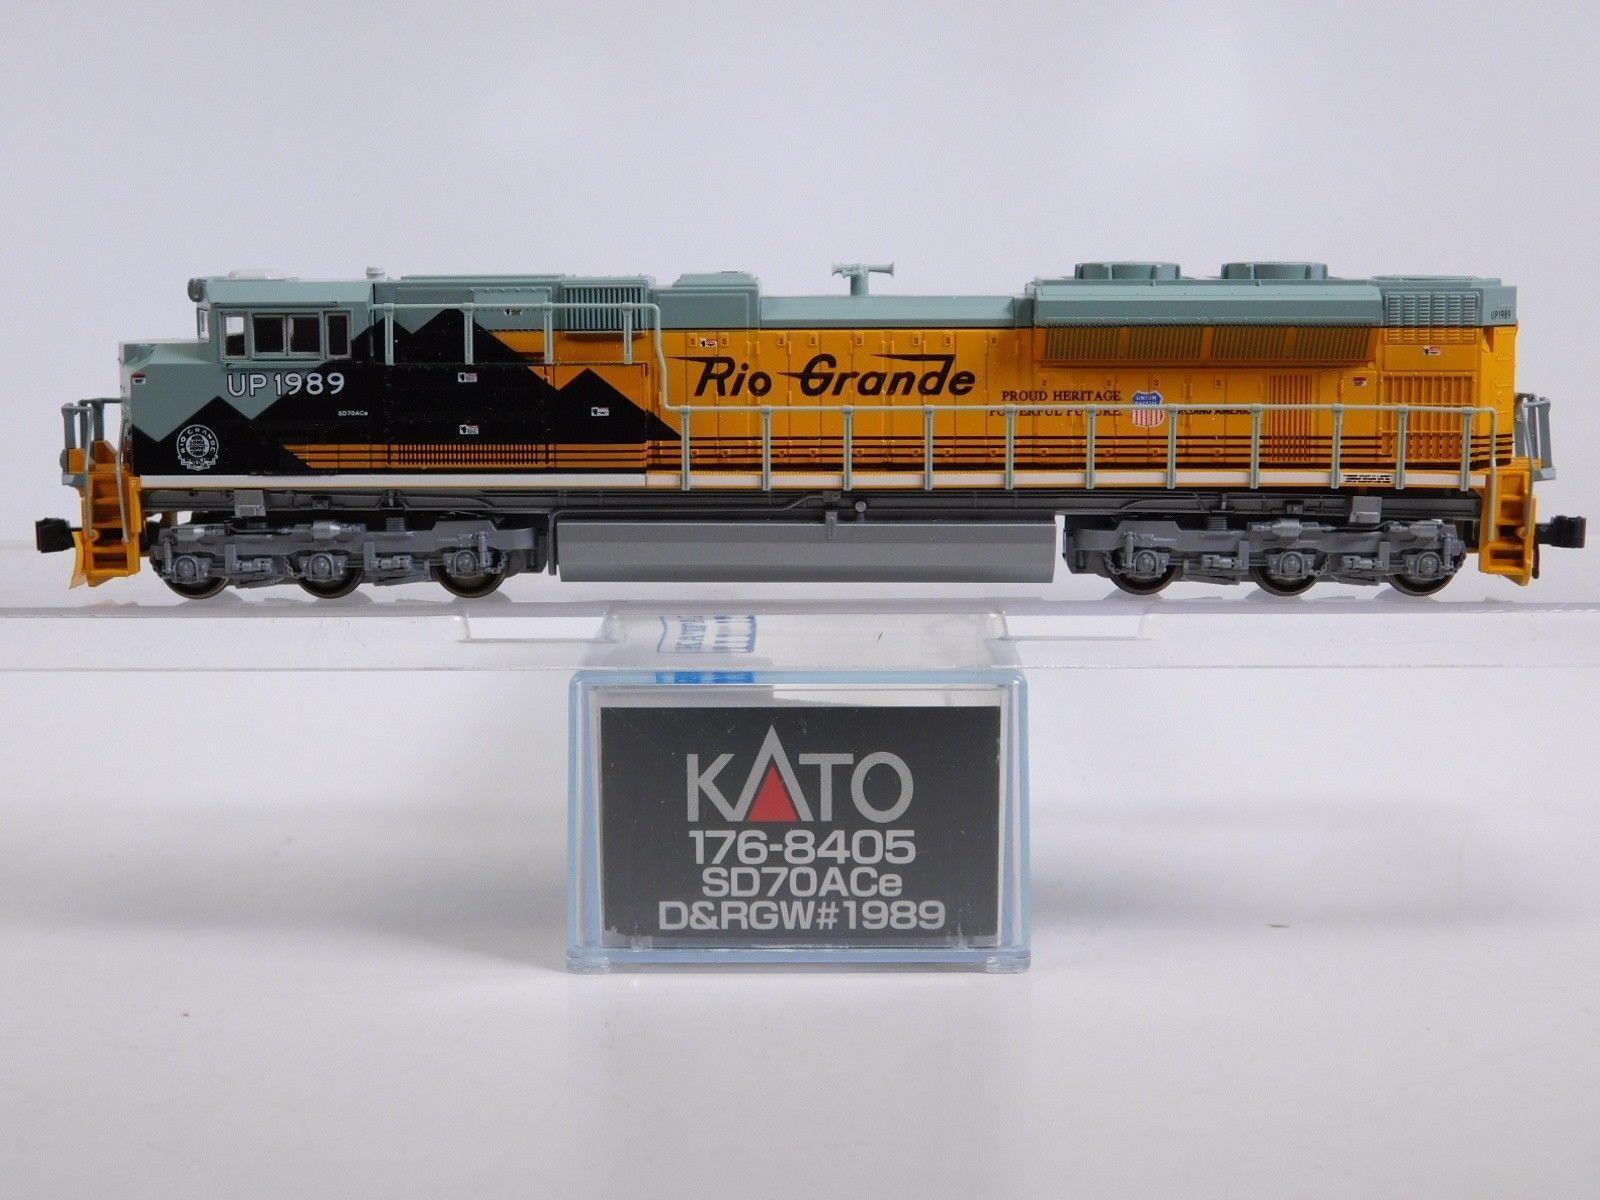 Nuovo Kato N Scale D&RGW SD70Ace UP Denver Rio Grande Western Locomotive 176-8405